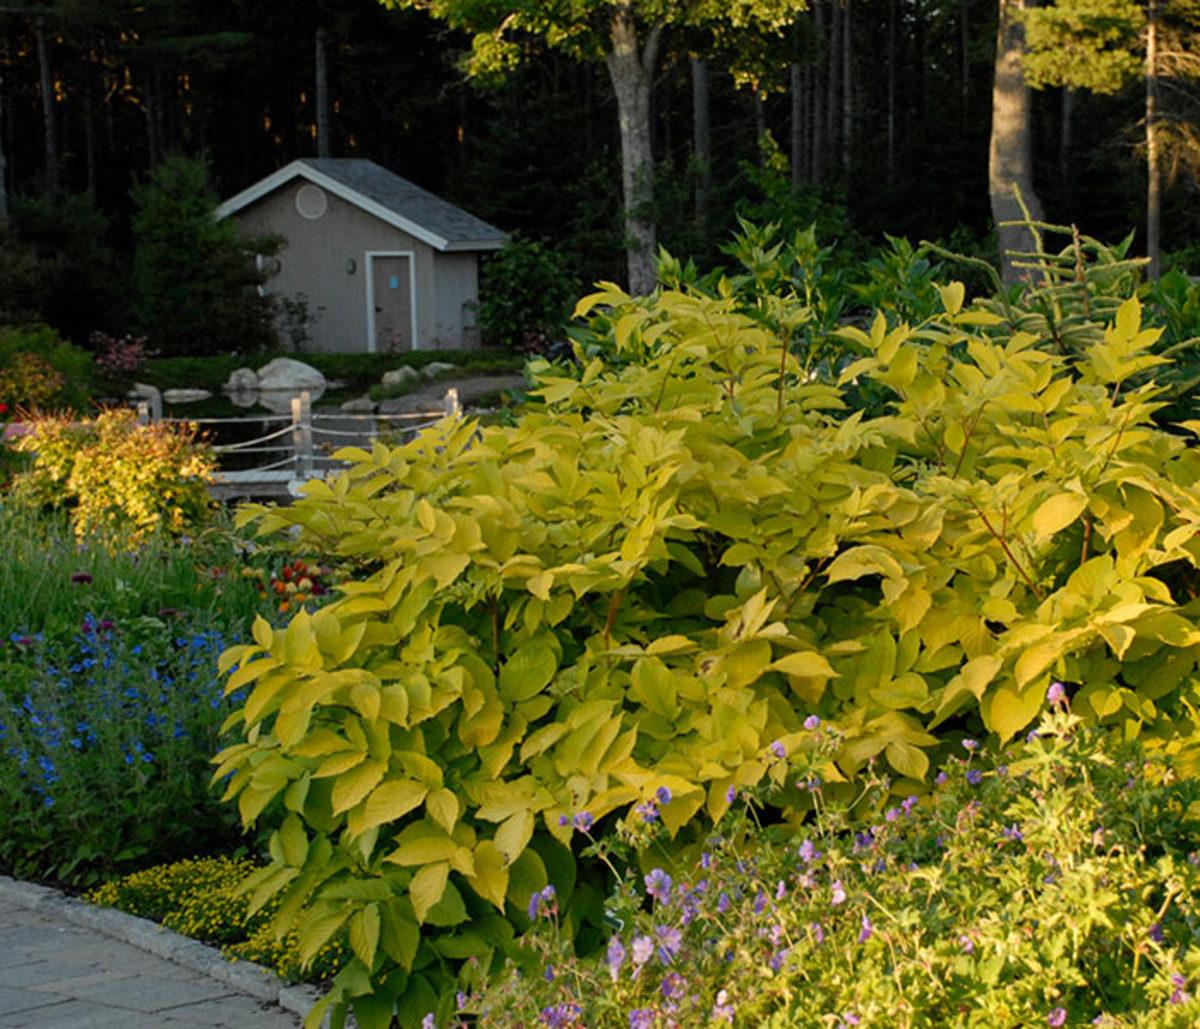 'Sun King' aralia (Aralia cordata 'Sun King') is a bulky perennial for shaded spaces, where its golden foliage brightens the scene.